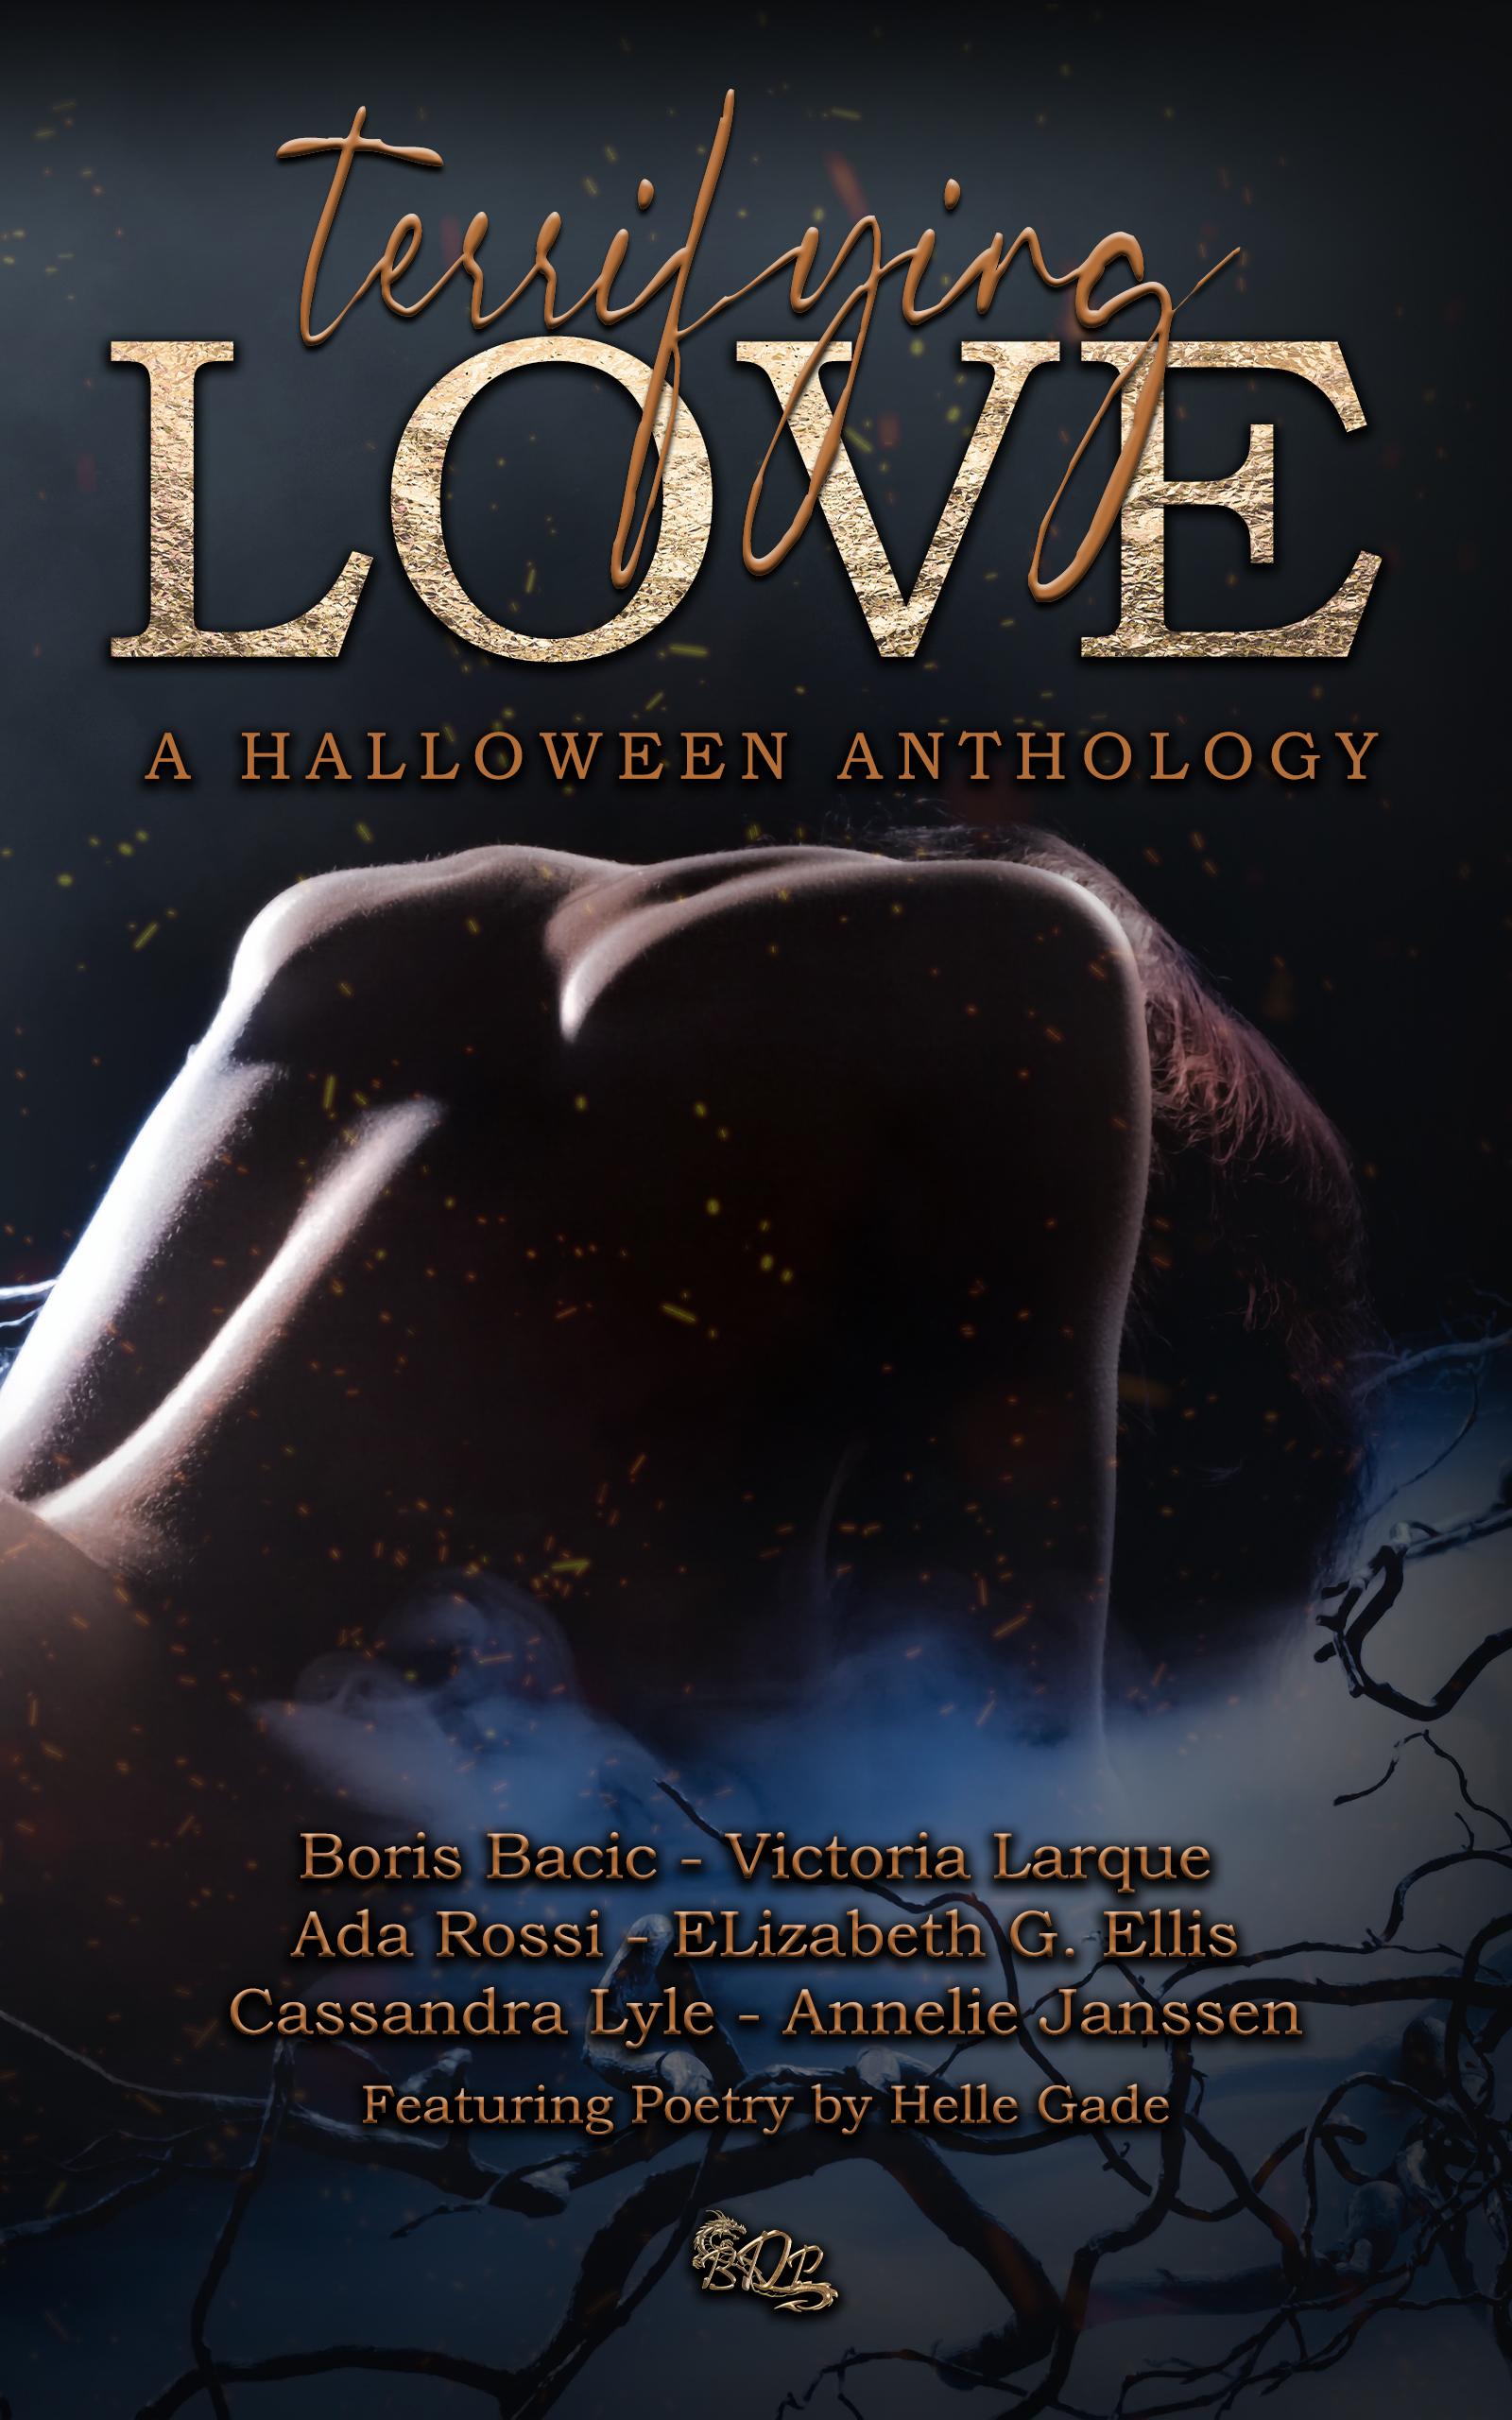 Terrifying Love - A Halloween Anthology, Isobella Dunn, Everly Taylor, Melody Calder, Victory Larque, Annelie Janssen, Ada Rossi, Helle Gade, Butterdragons